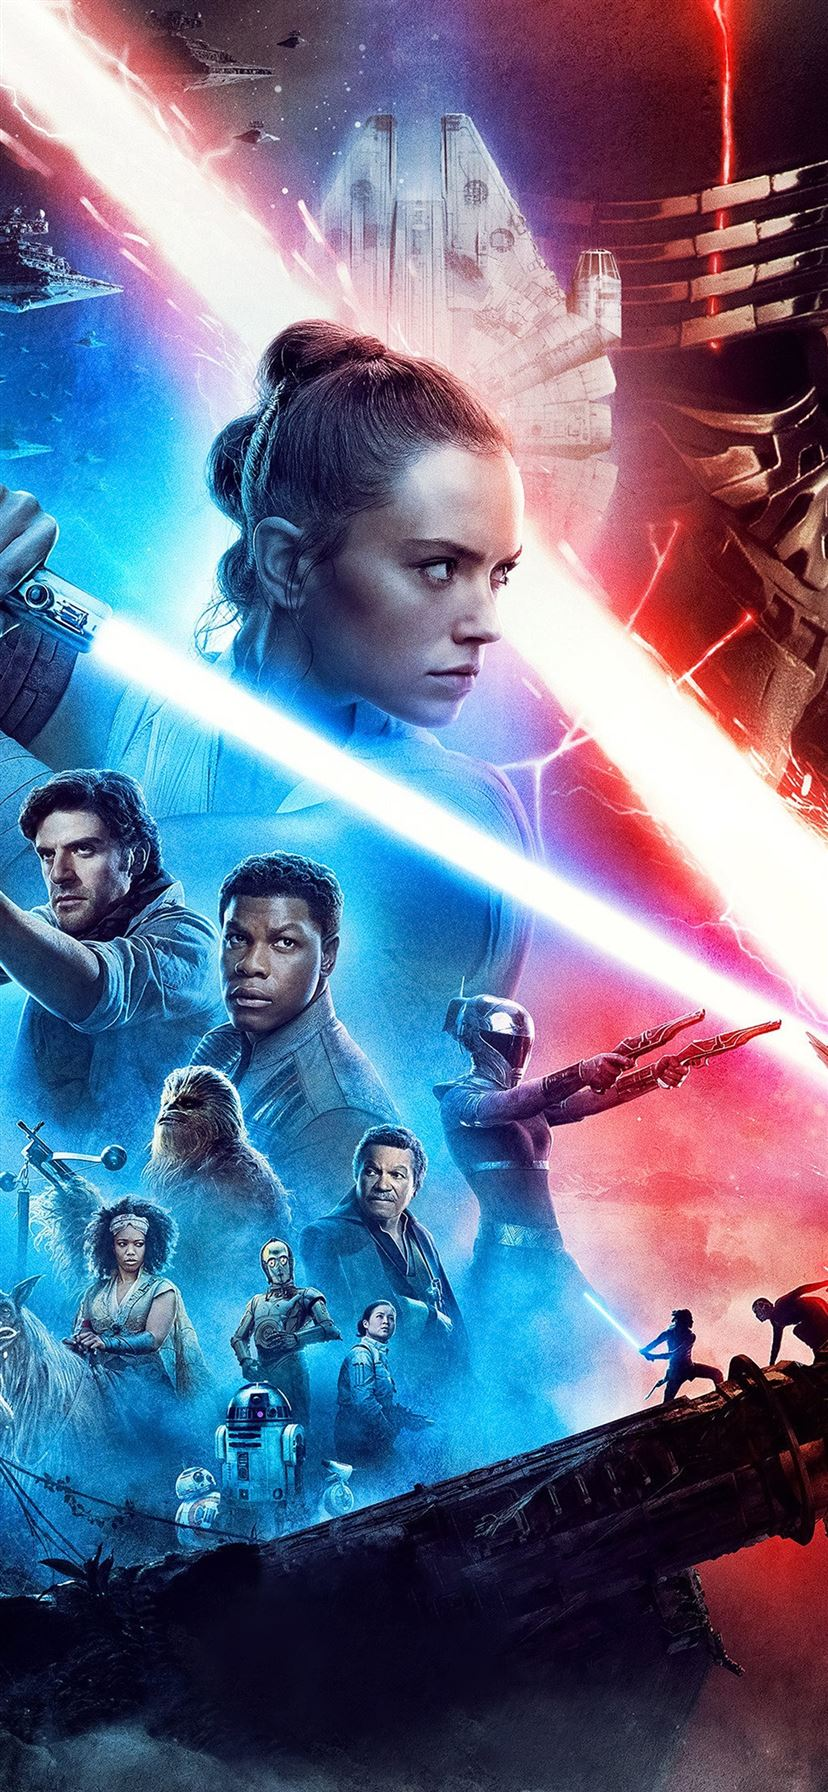 Best Star Wars Iphone 11 Wallpapers Hd 2020 Ilikewallpaper